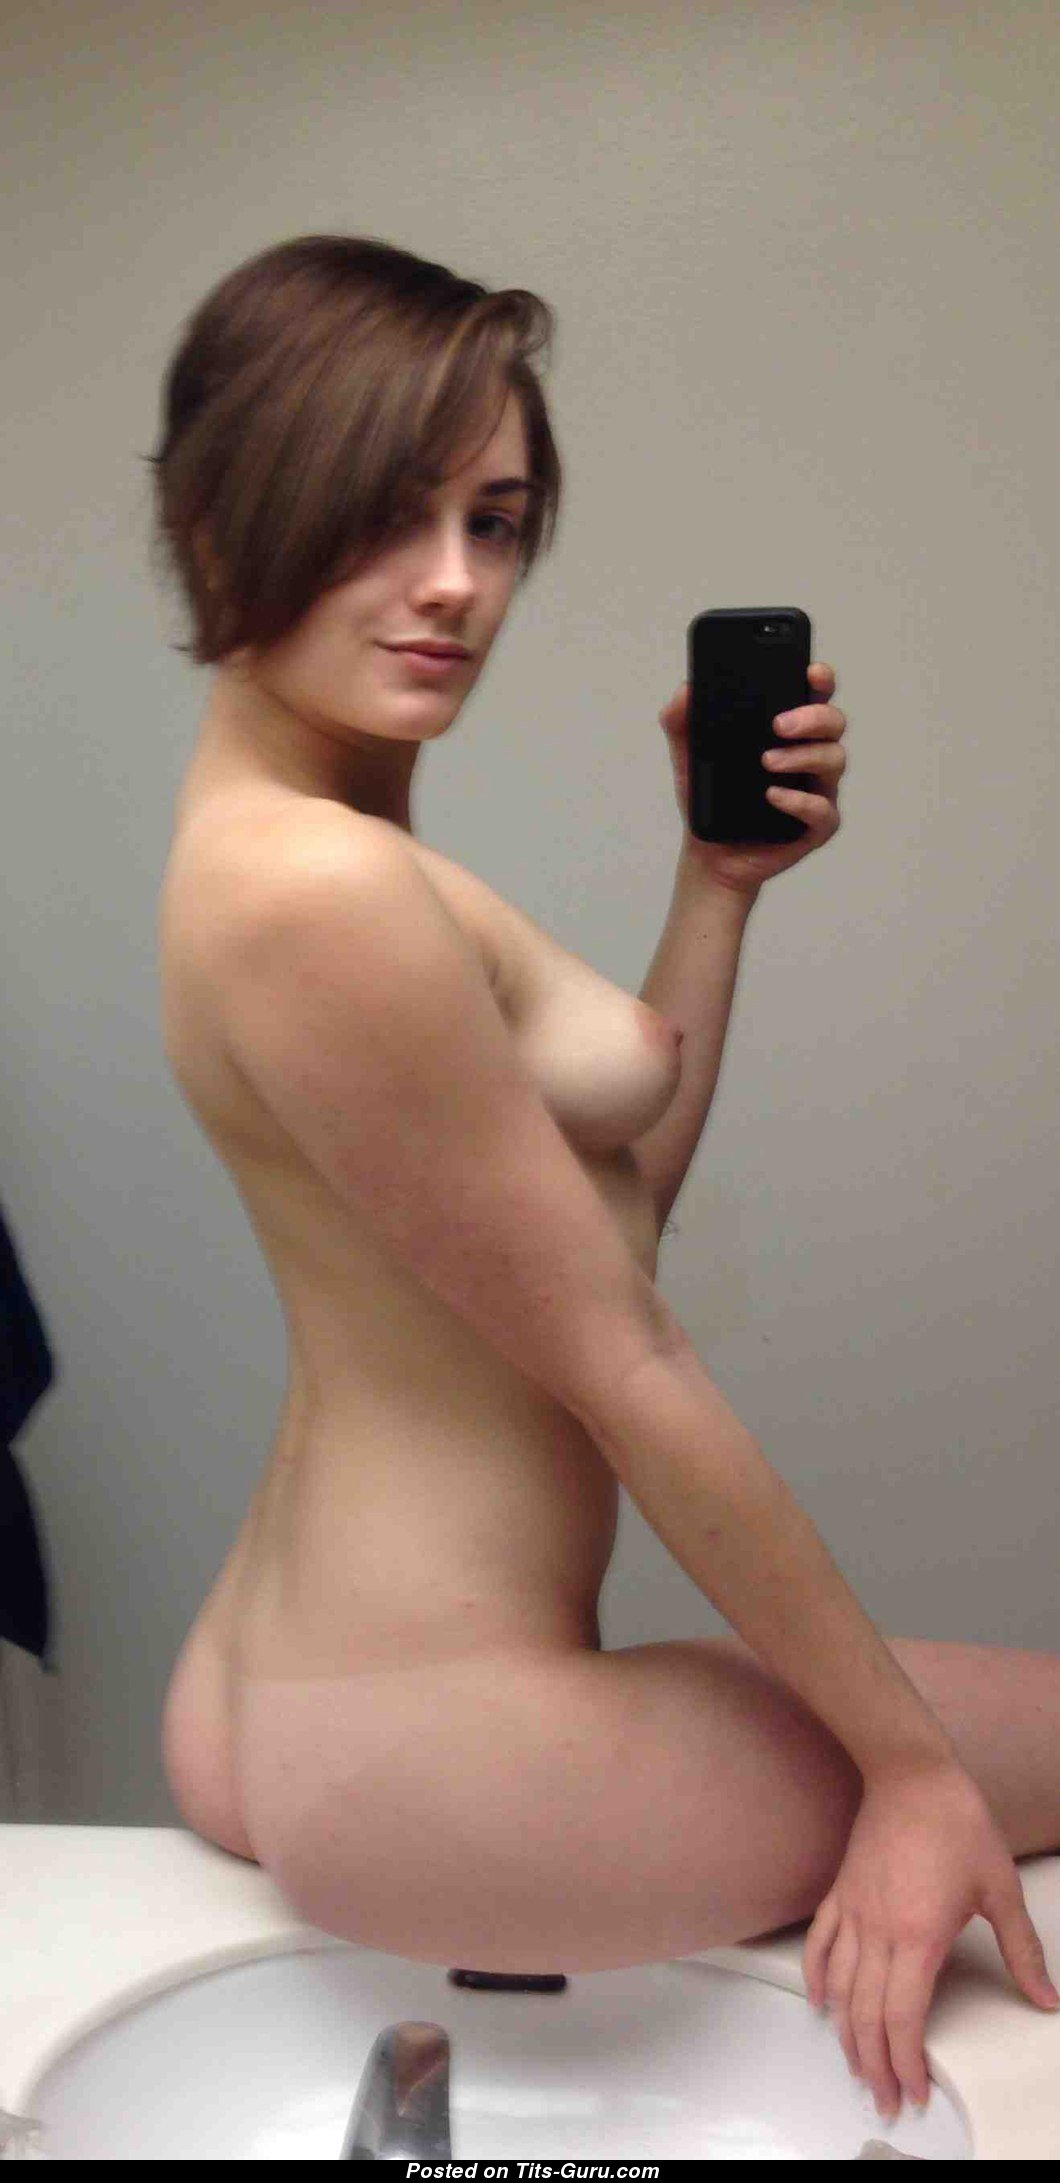 sexy topless amateur hot woman with medium natural boobies selfie